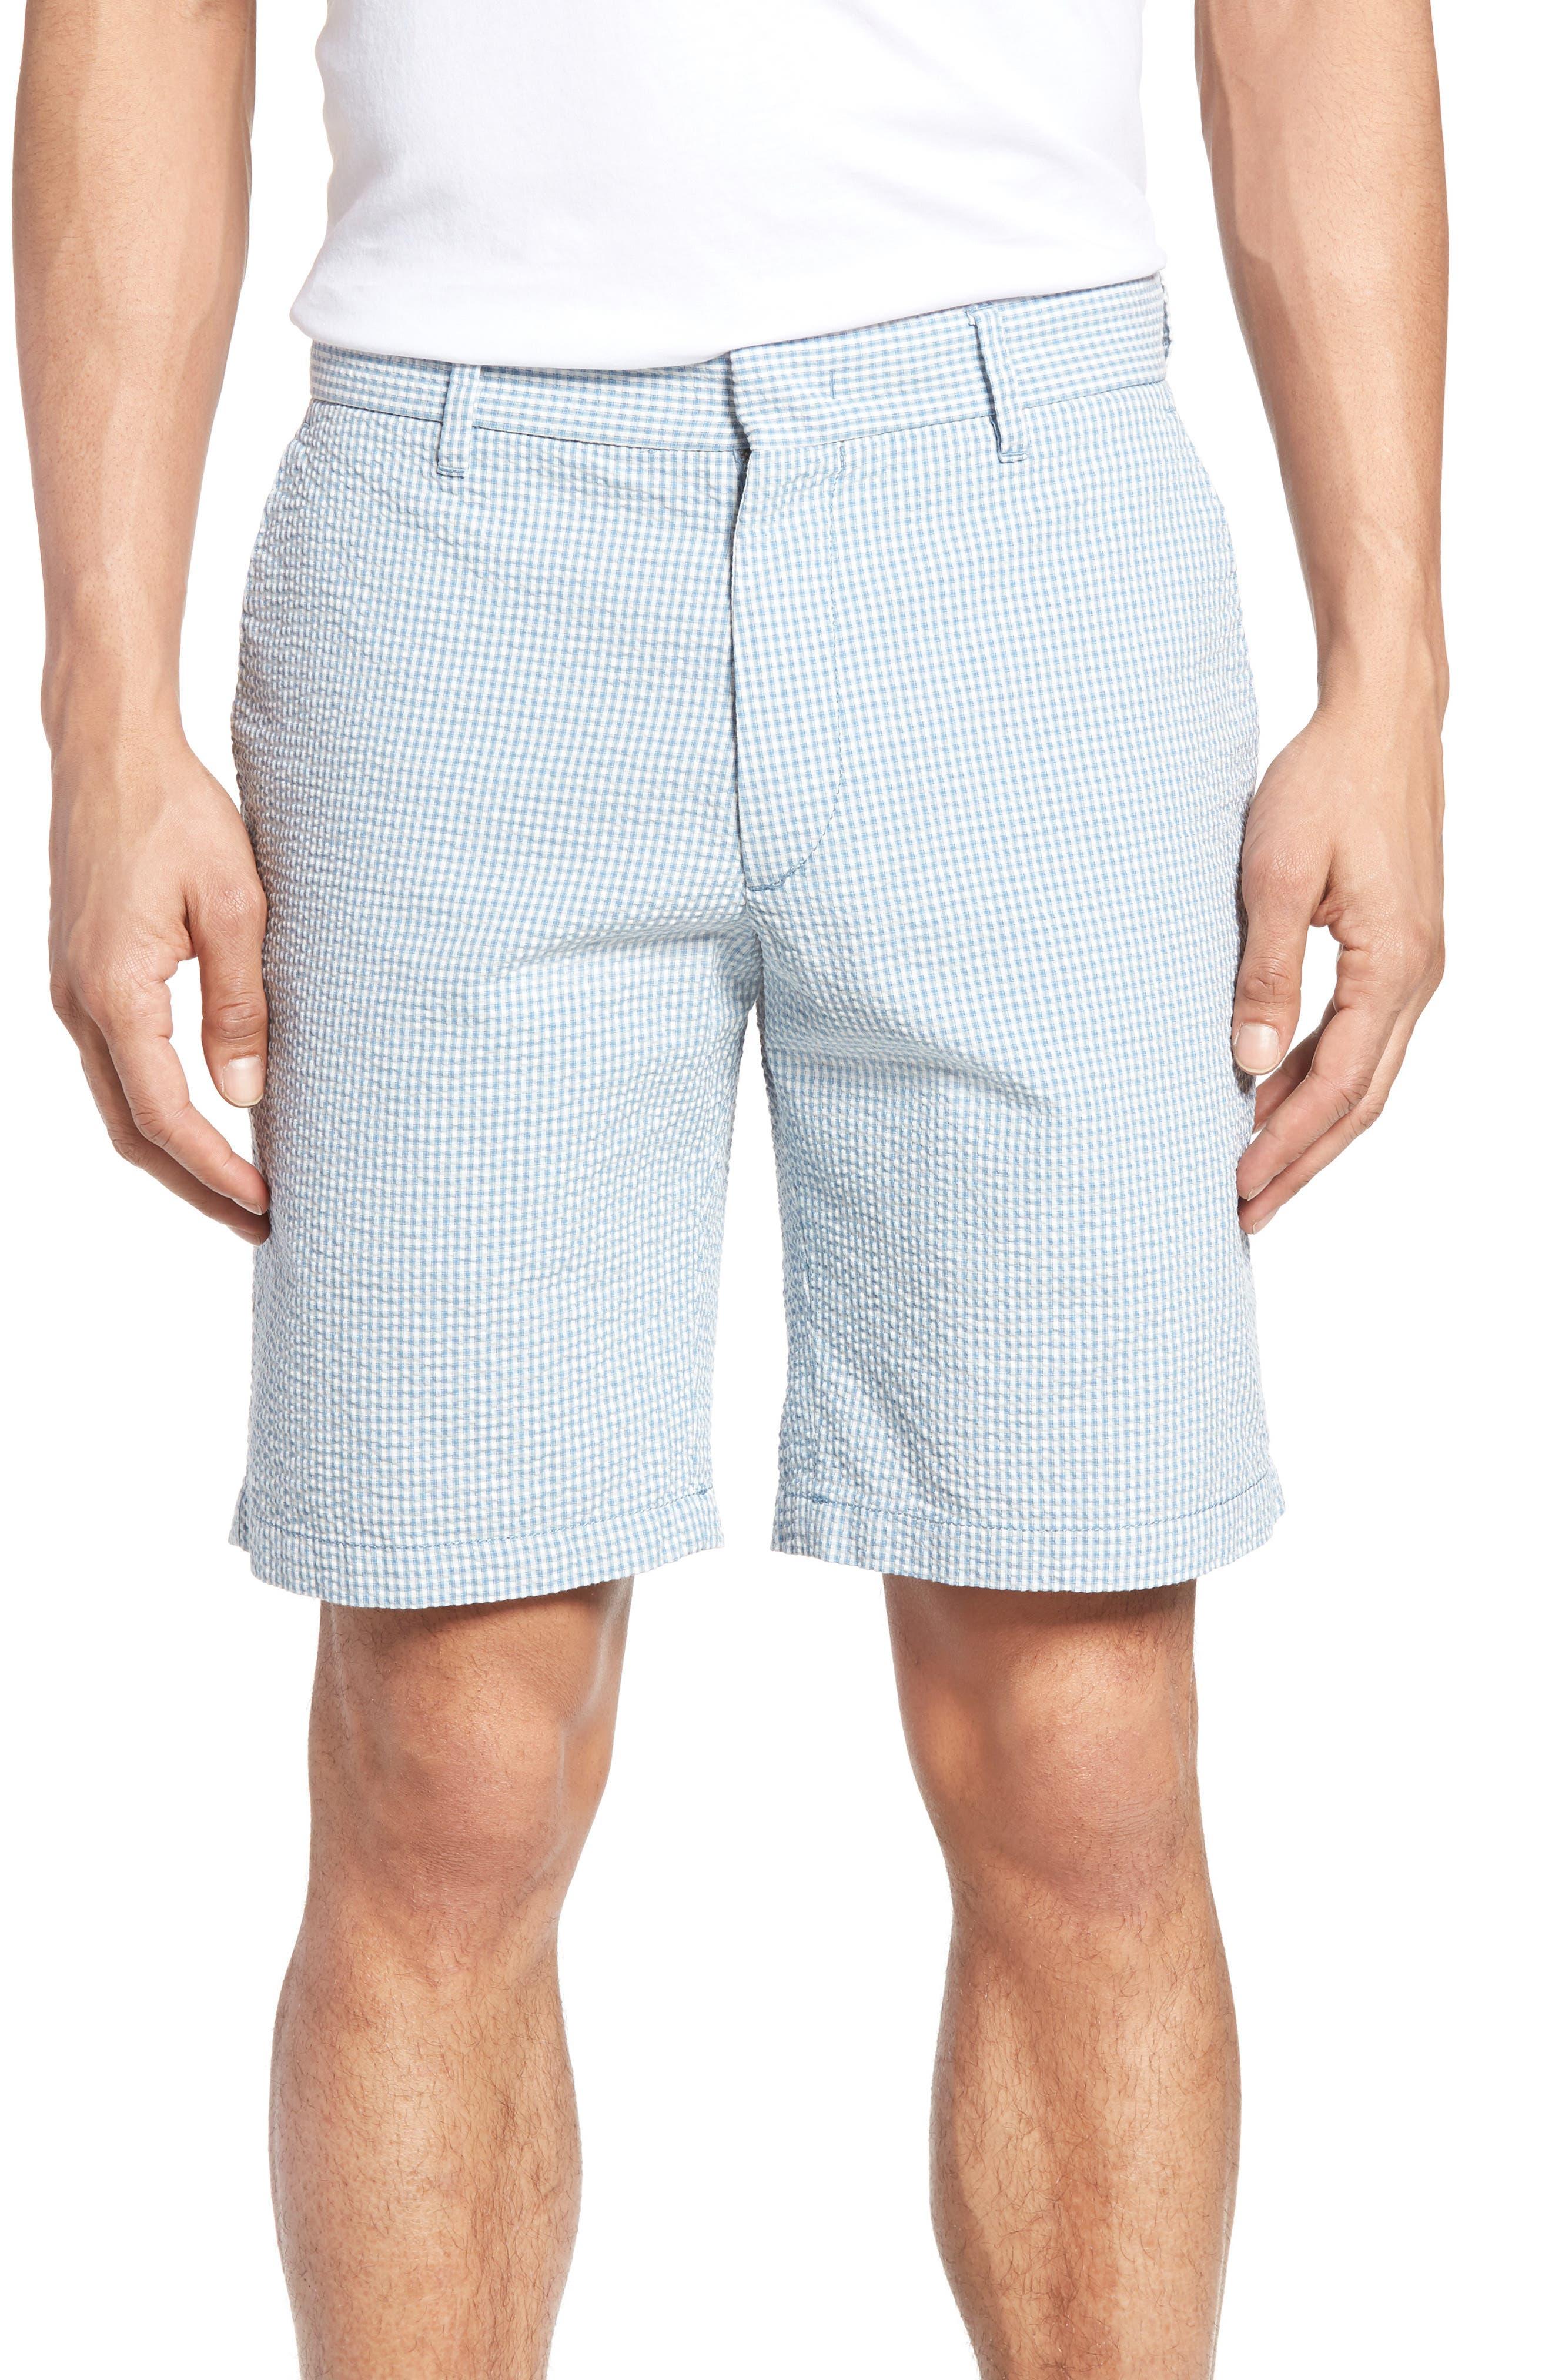 Alternate Image 1 Selected - Zachary Prell Fringe Check Seersucker Shorts